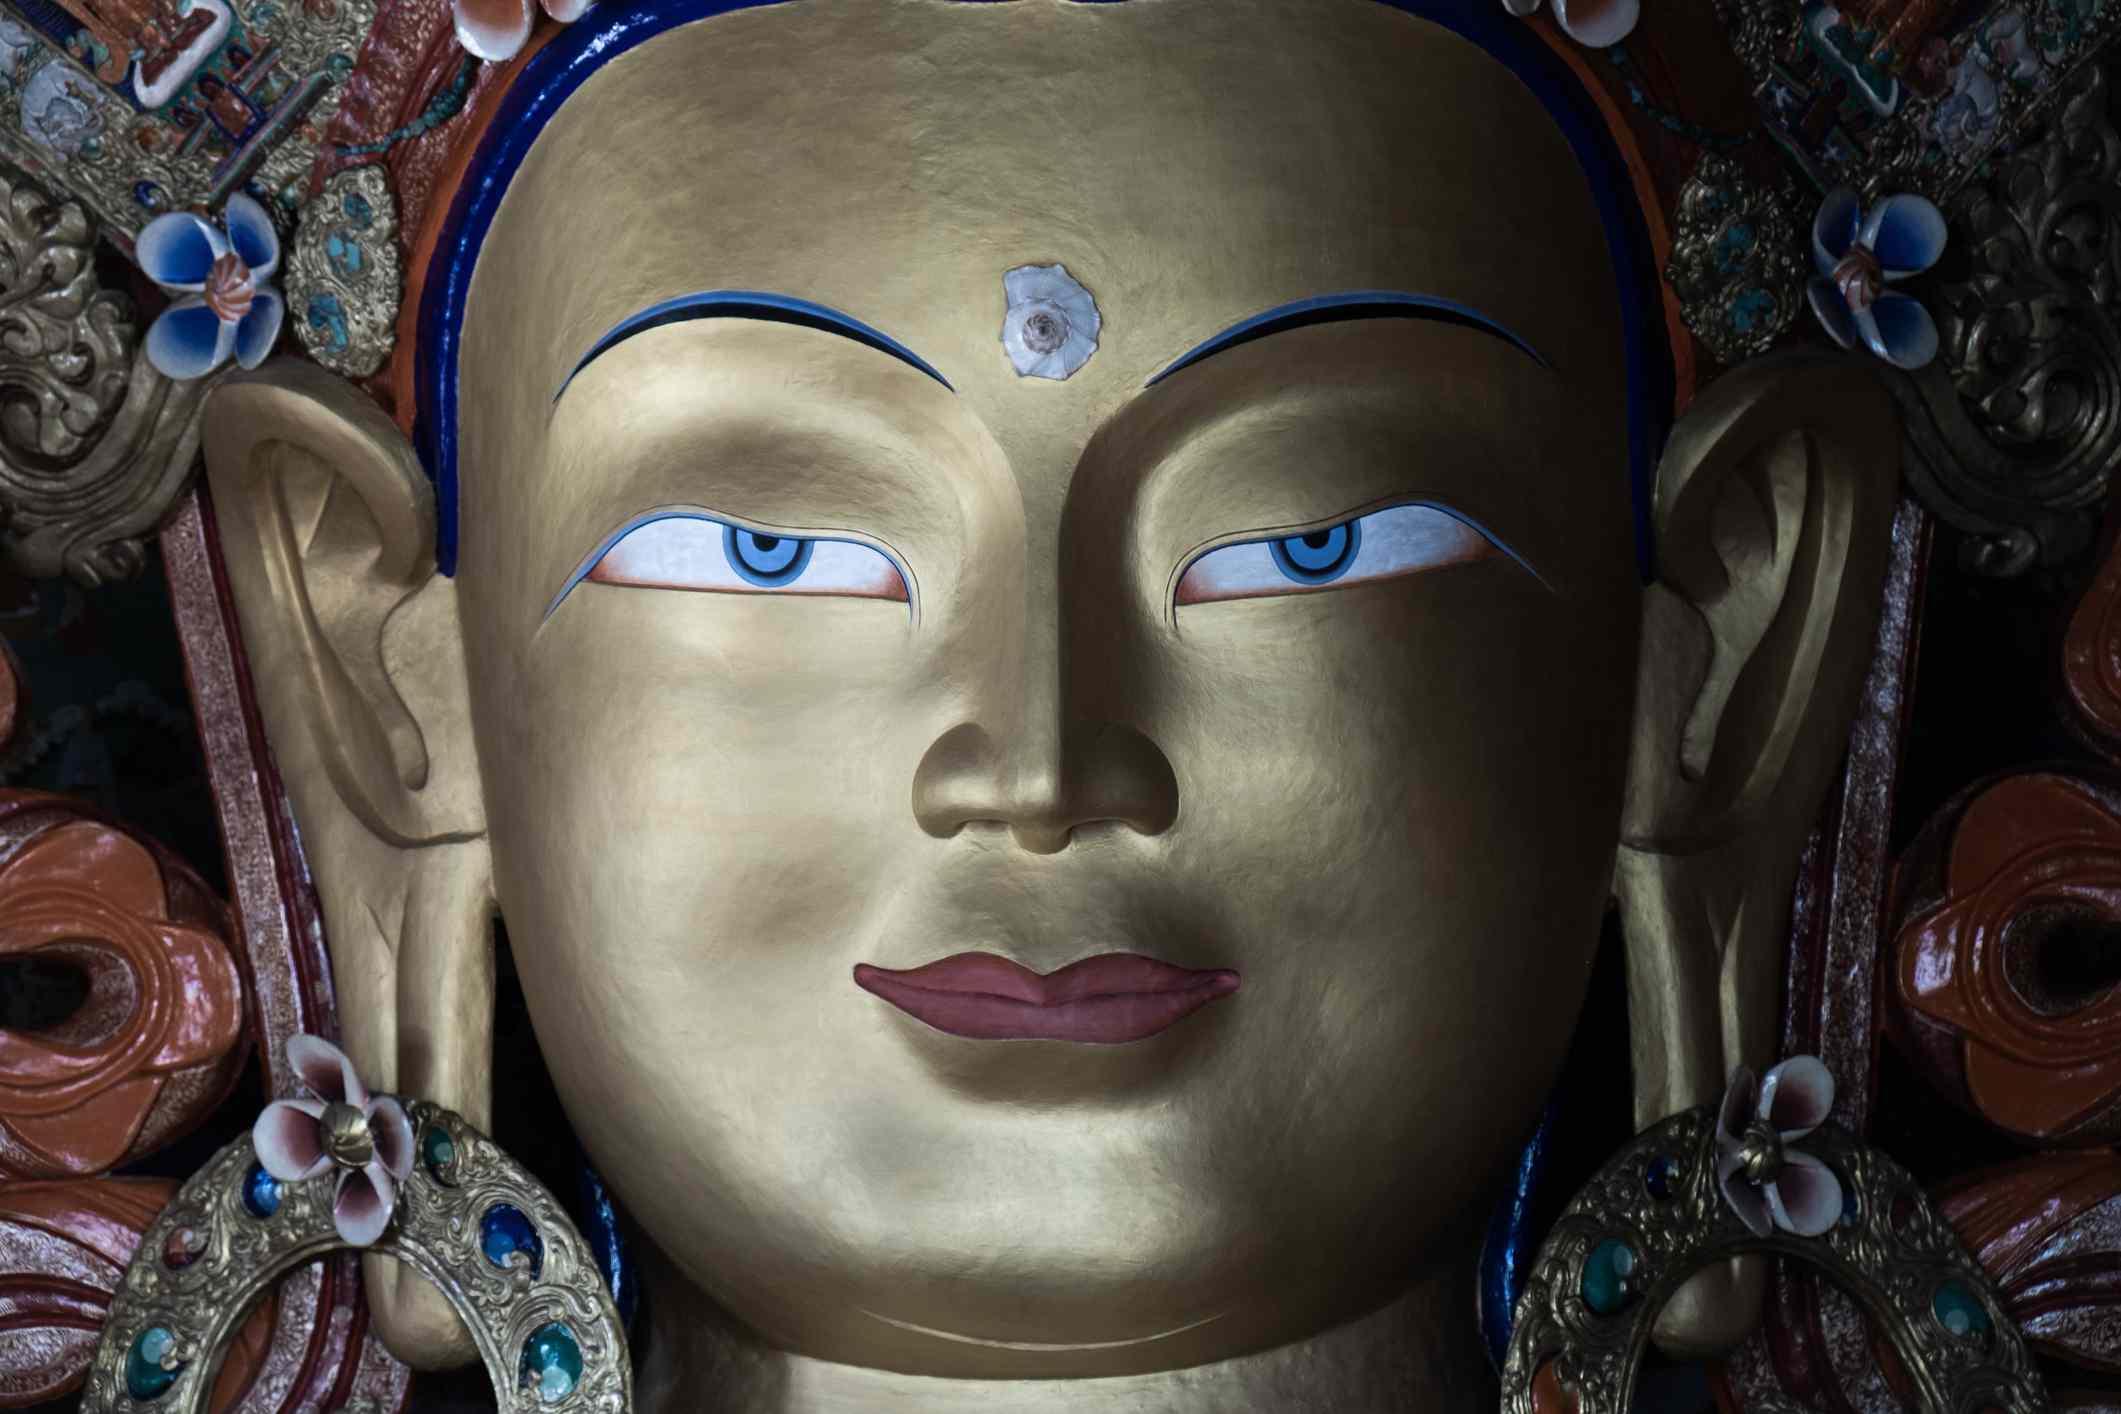 Close-up shot of Statue of Maitreya Buddha at Thiksey Monastery, Ladakh, India